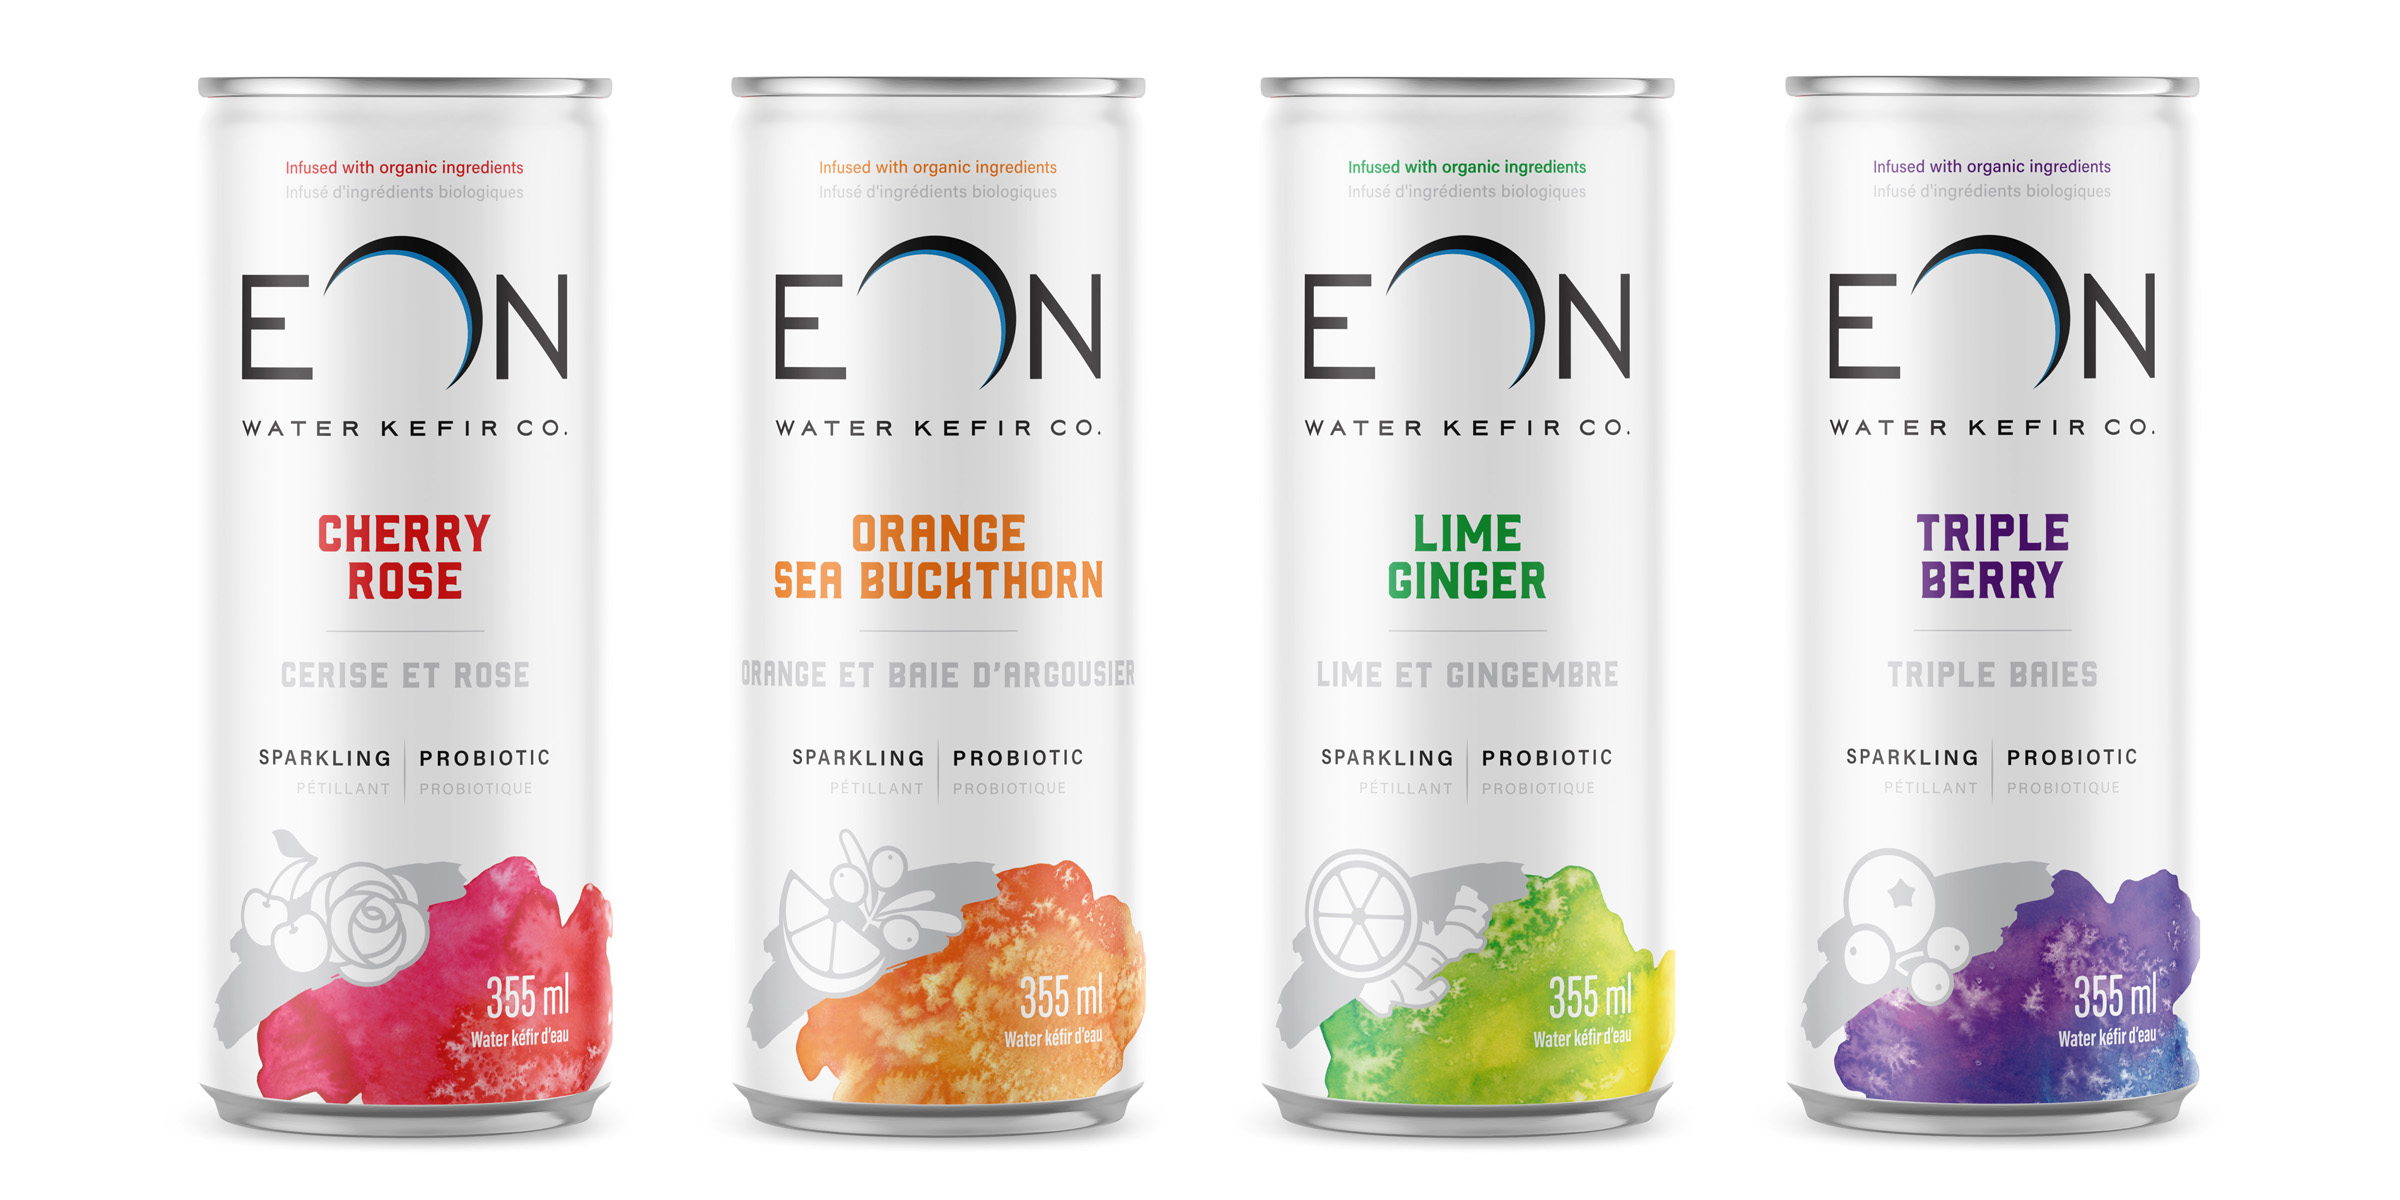 Eon water packaging design